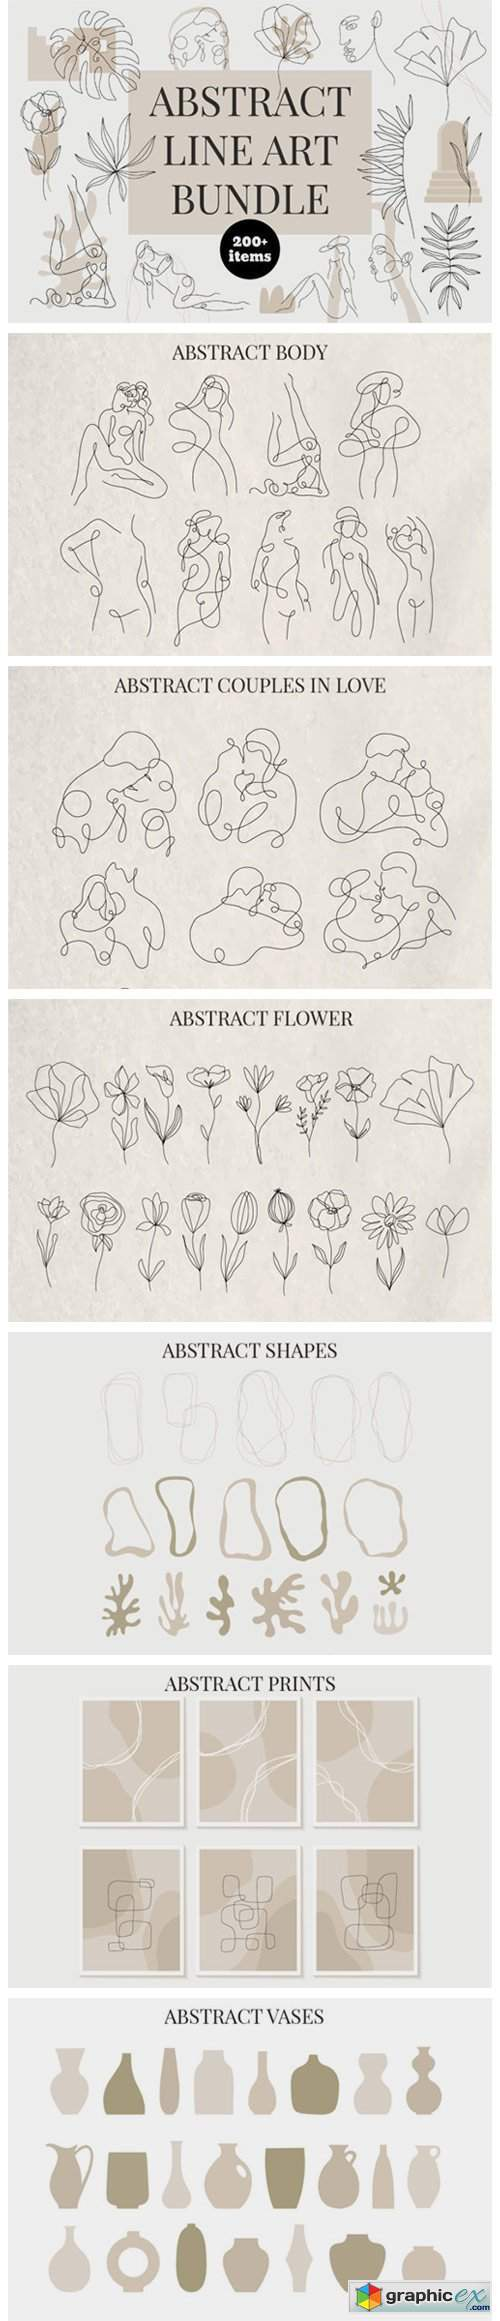 Abstract Line Art Bundle